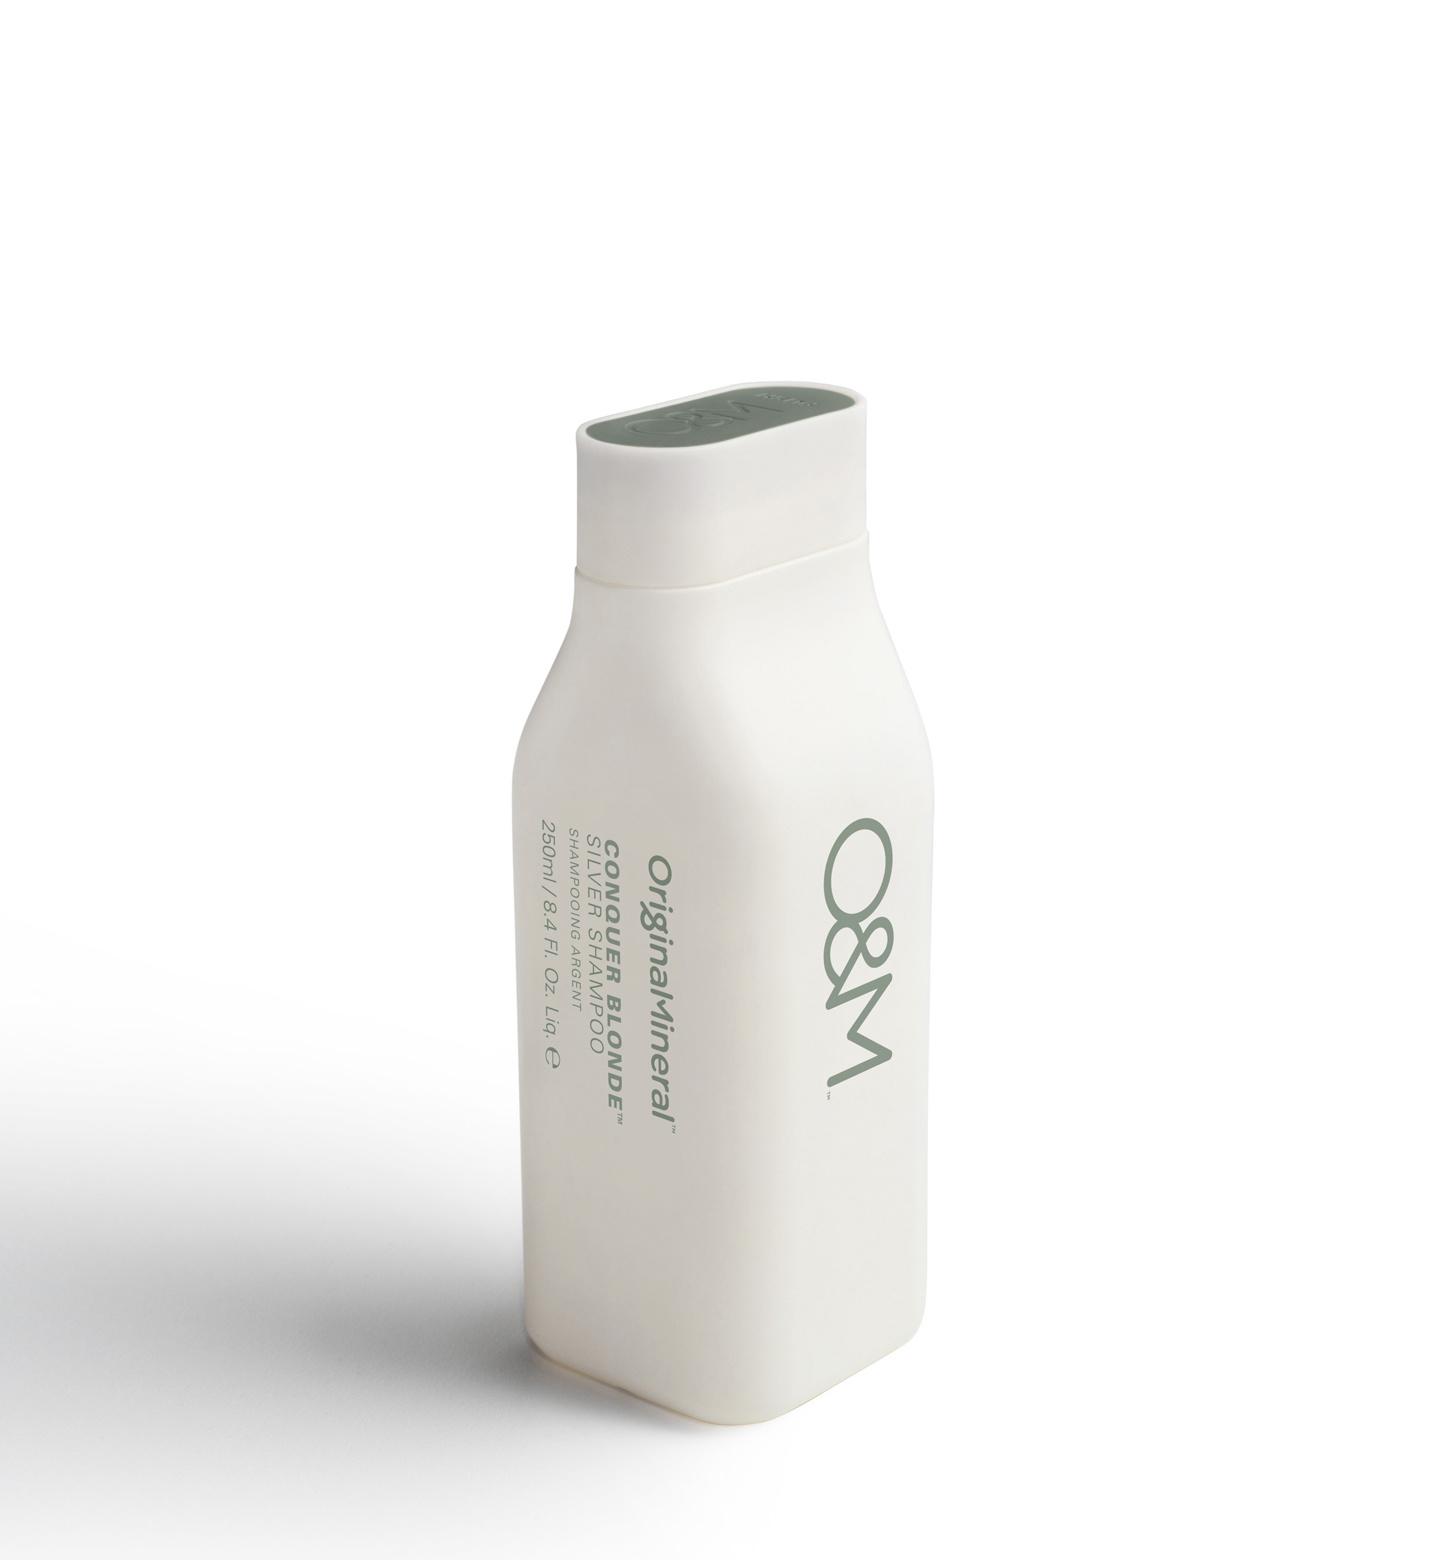 O&M - Original Mineral O&M Conquer Blonde Silver Shampooing pour cheveux blonds argentés - 250ml